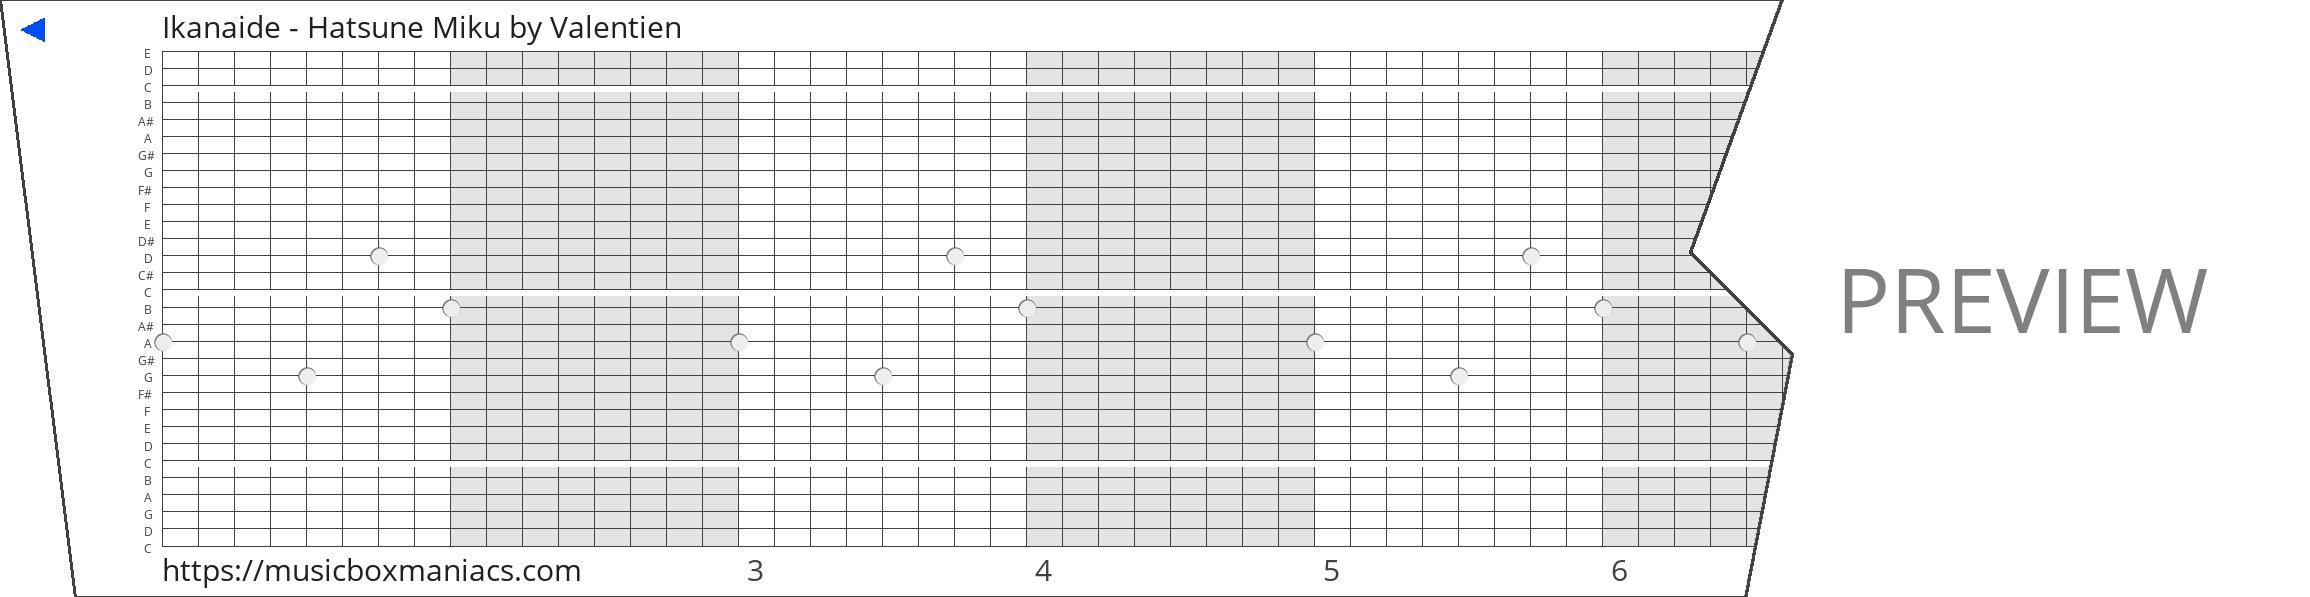 Ikanaide - Hatsune Miku 30 note music box paper strip